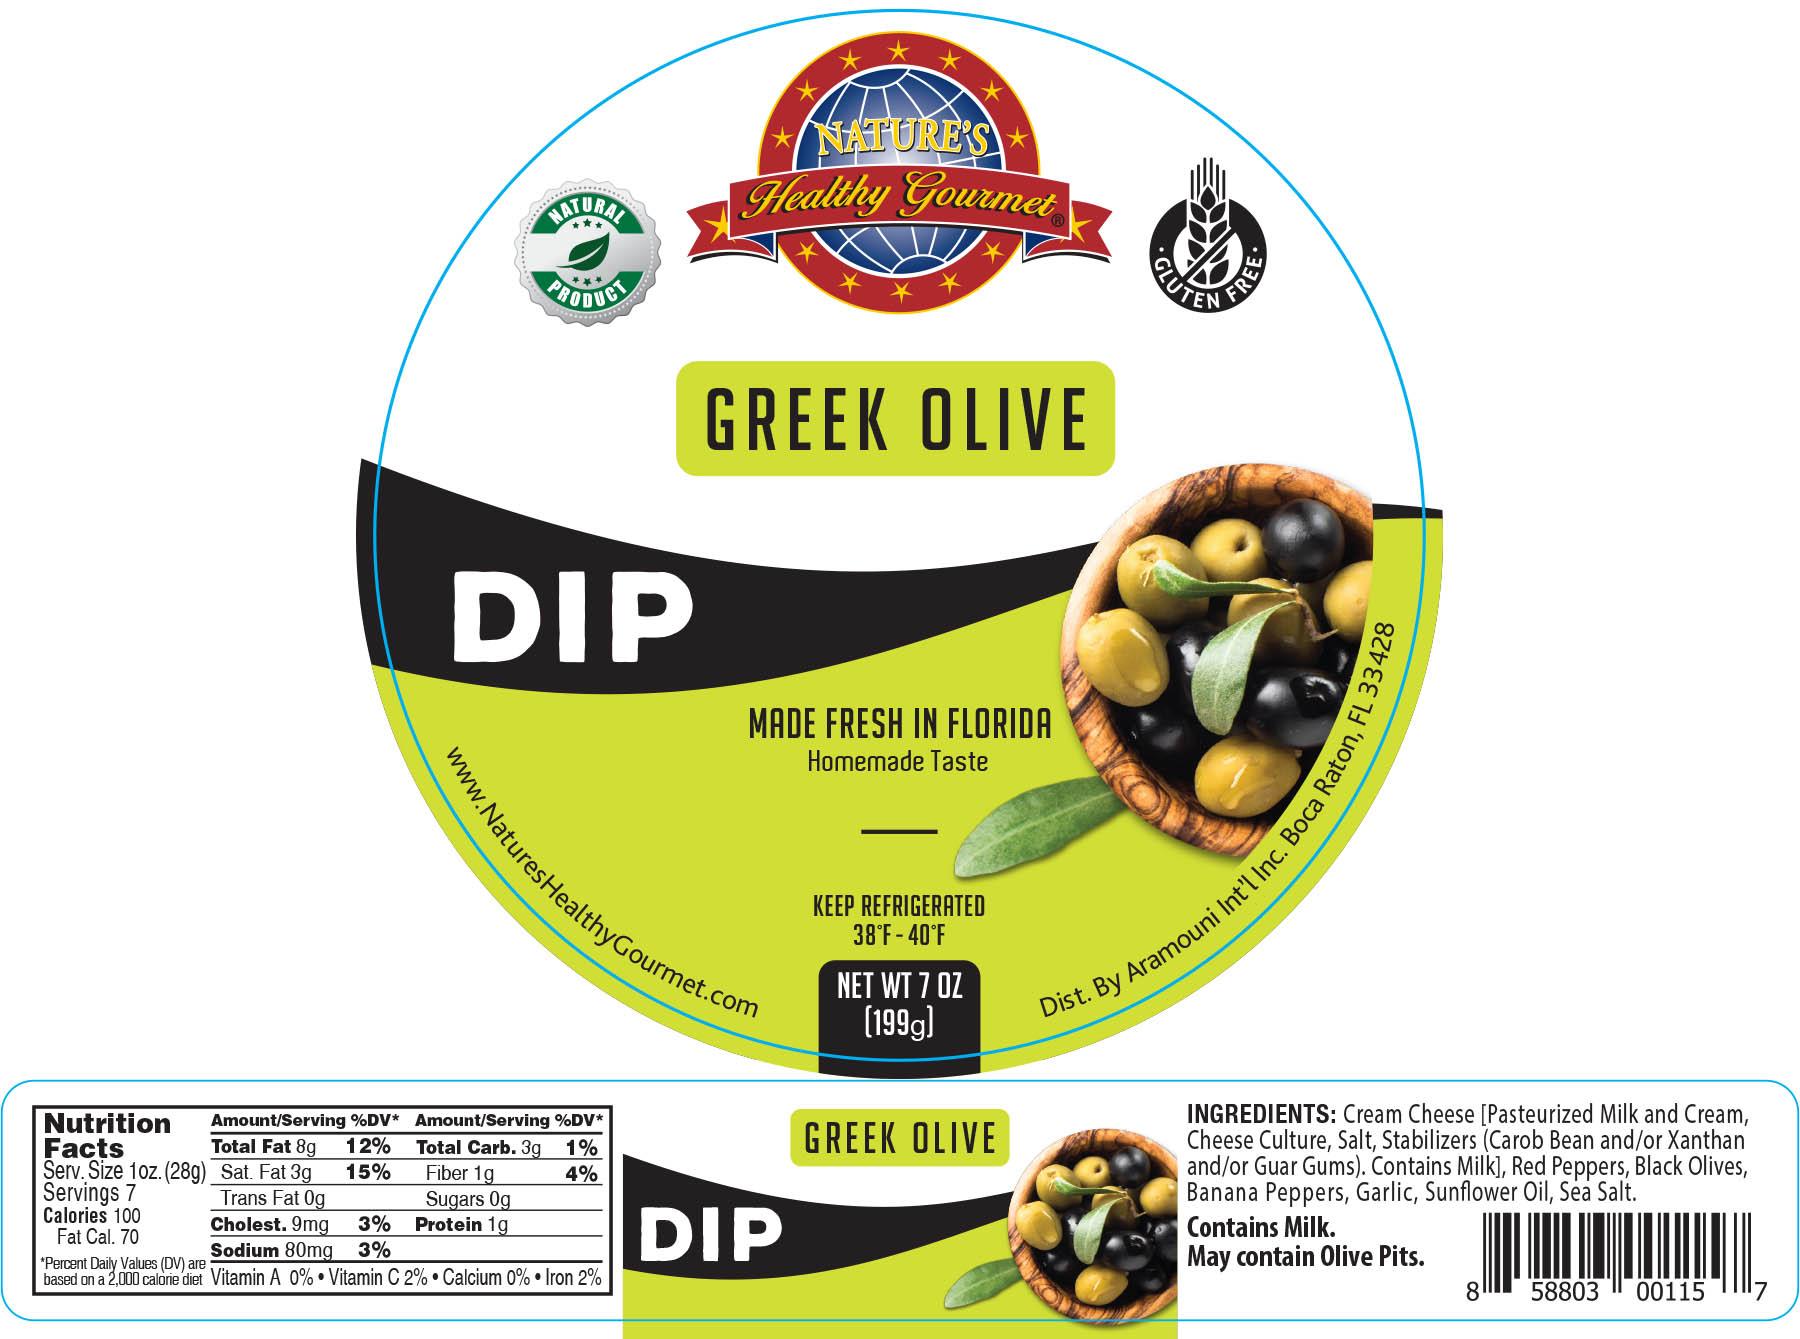 Nature's Greek Olive Dip